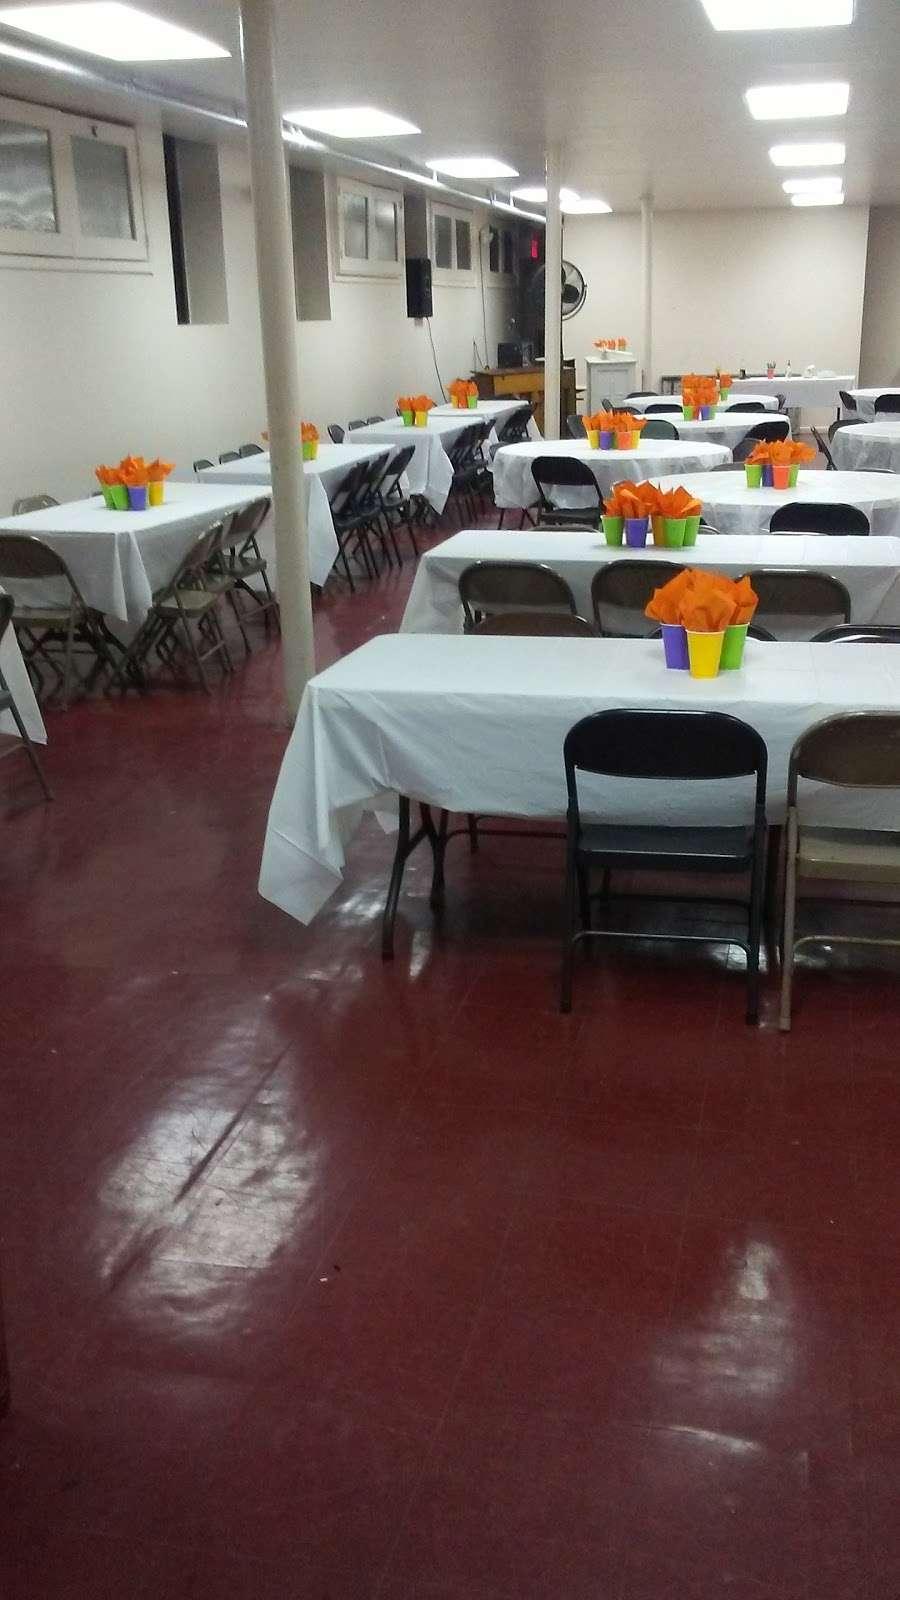 First Calvary Baptist Church - church    Photo 5 of 6   Address: 953 Putnam Ave, Brooklyn, NY 11221, USA   Phone: (718) 453-1278